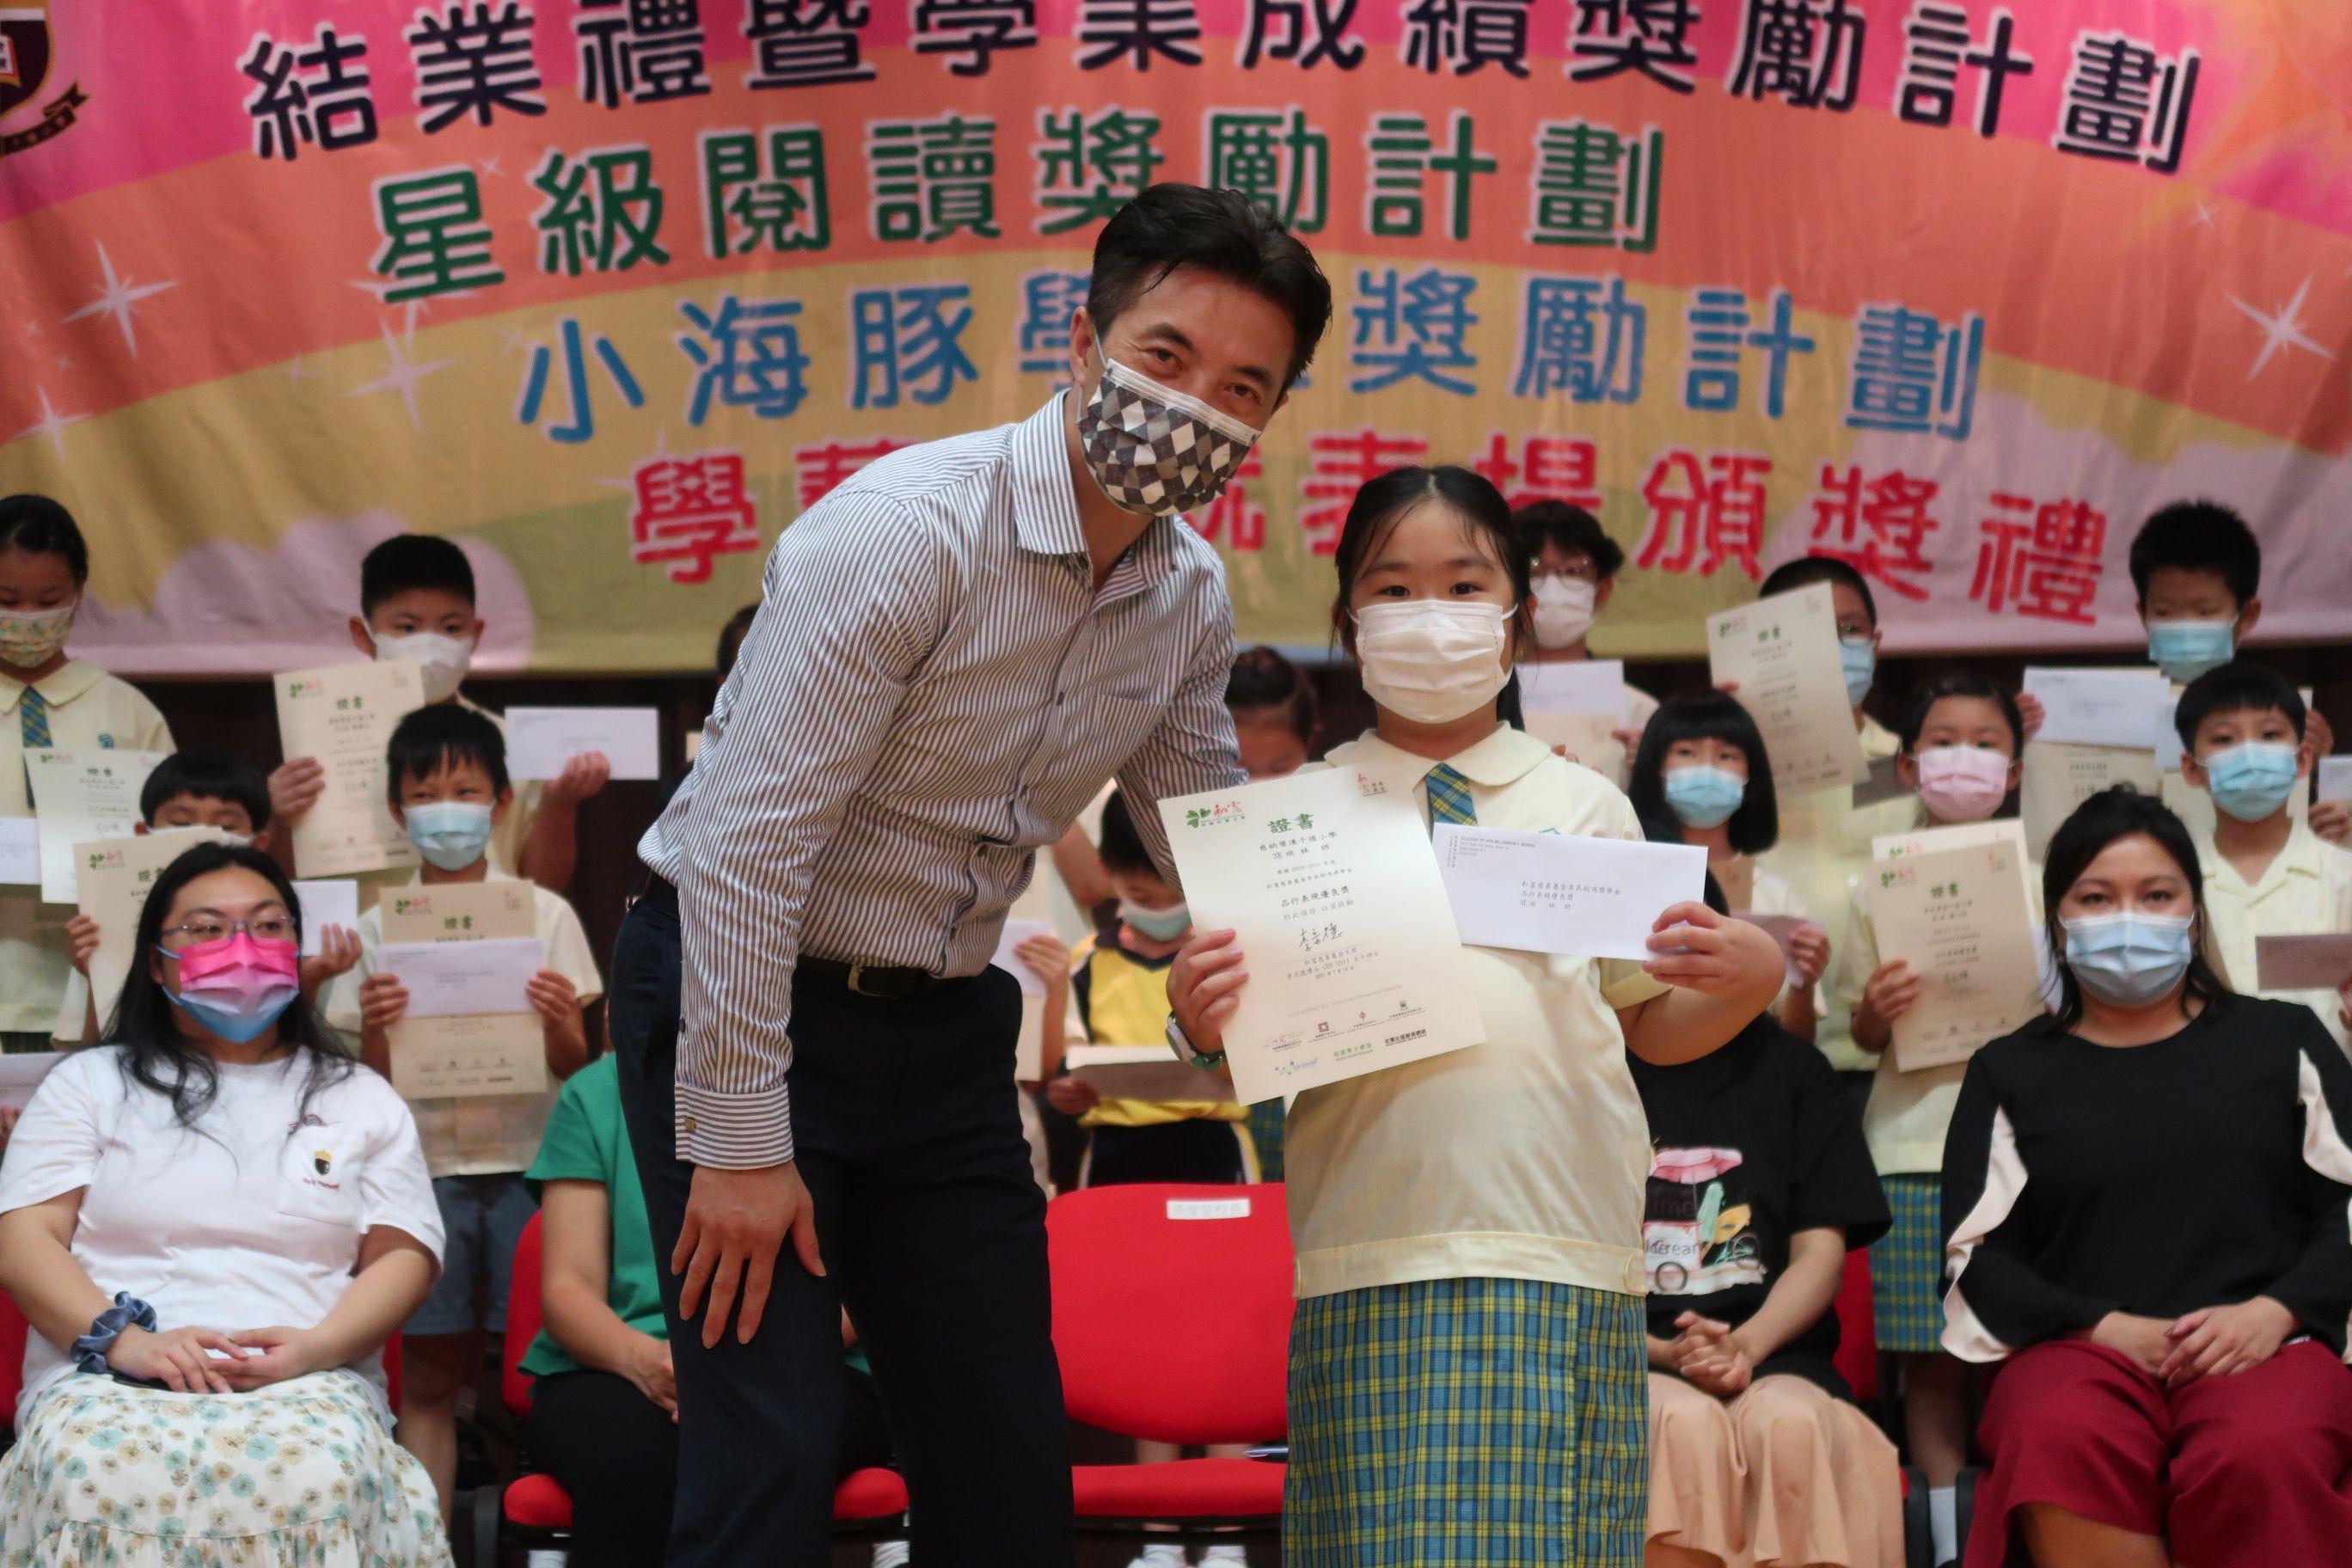 https://syh.edu.hk/sites/default/files/img_5965_1.jpg